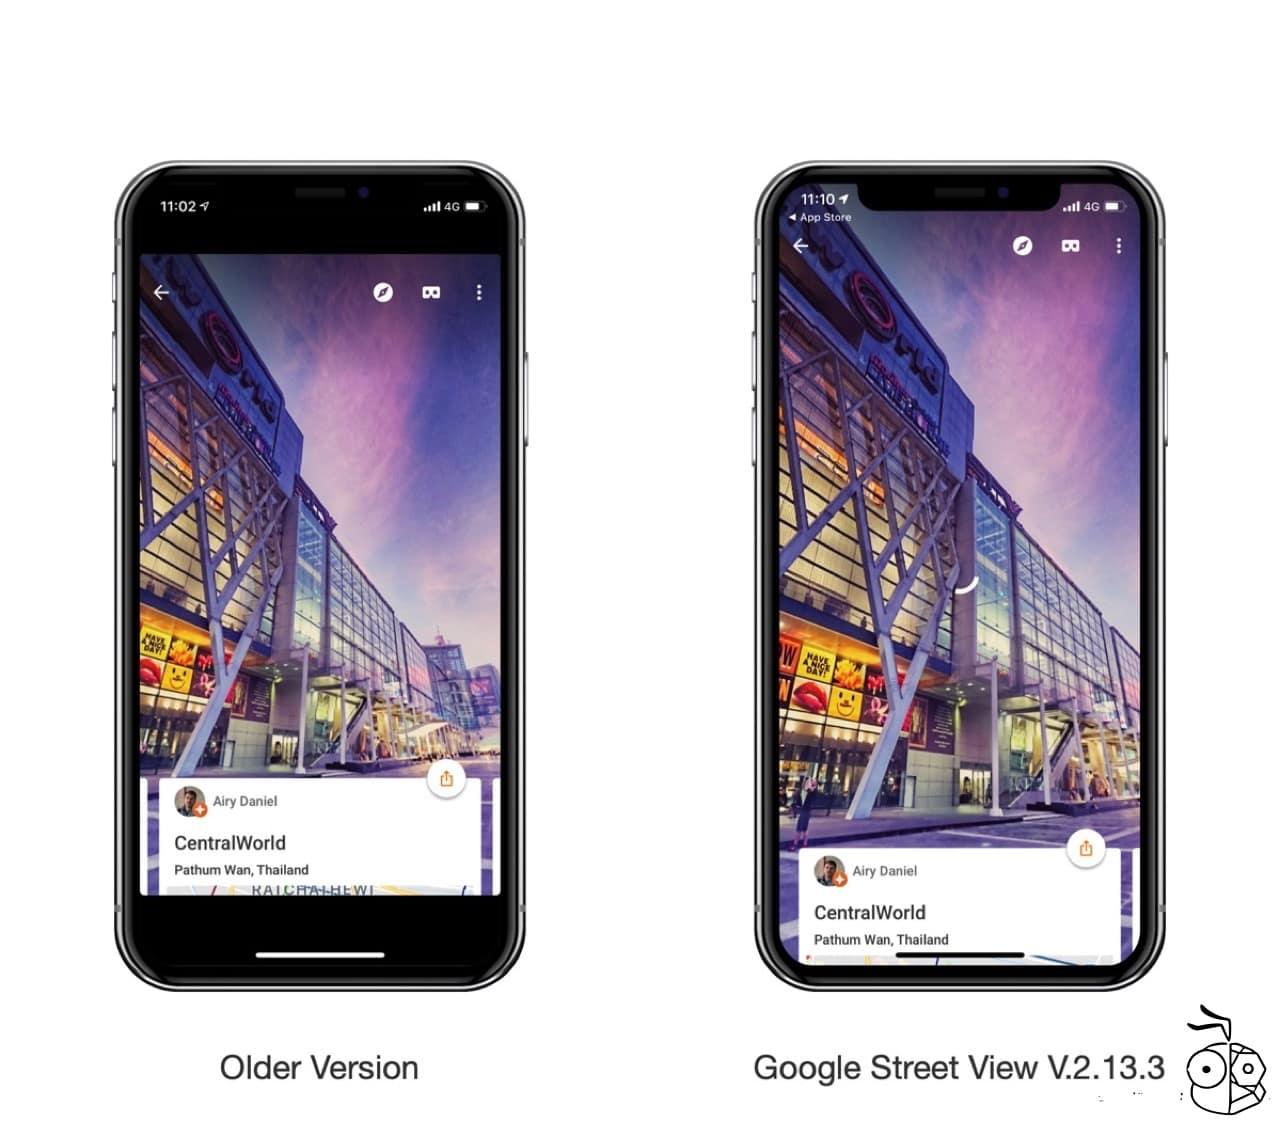 Google Street View V2.13.3 02